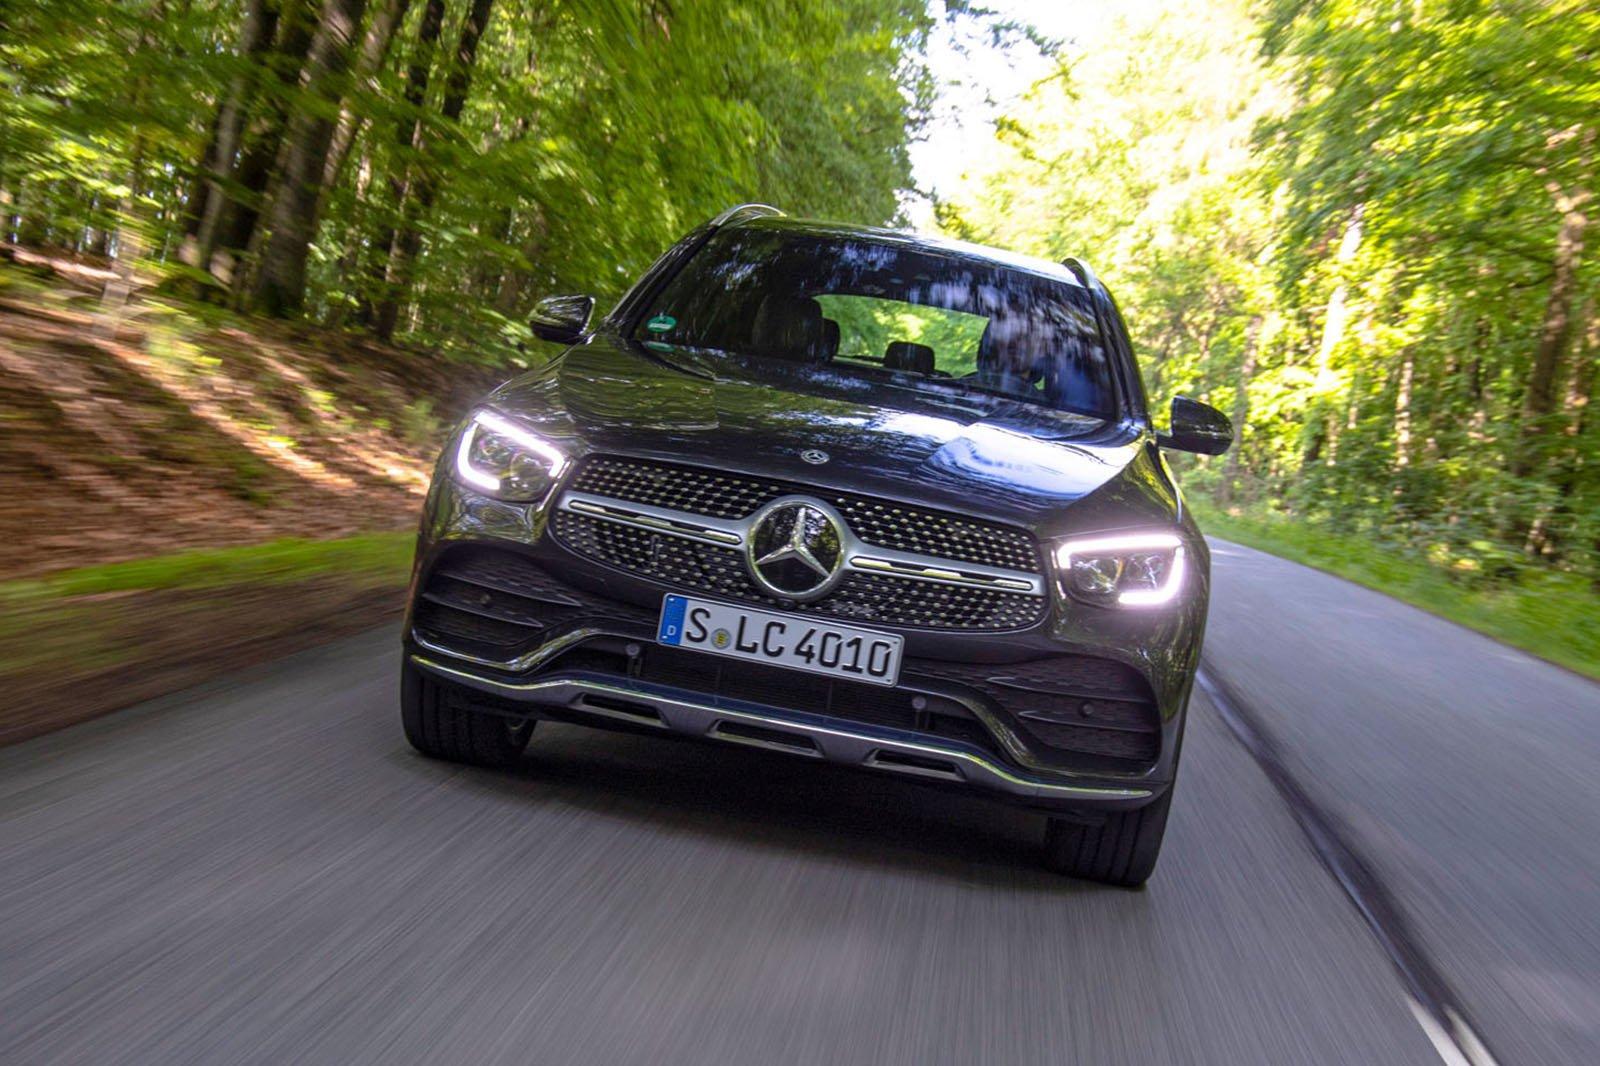 Mercedes GLC 2019 facelift front tracking shot